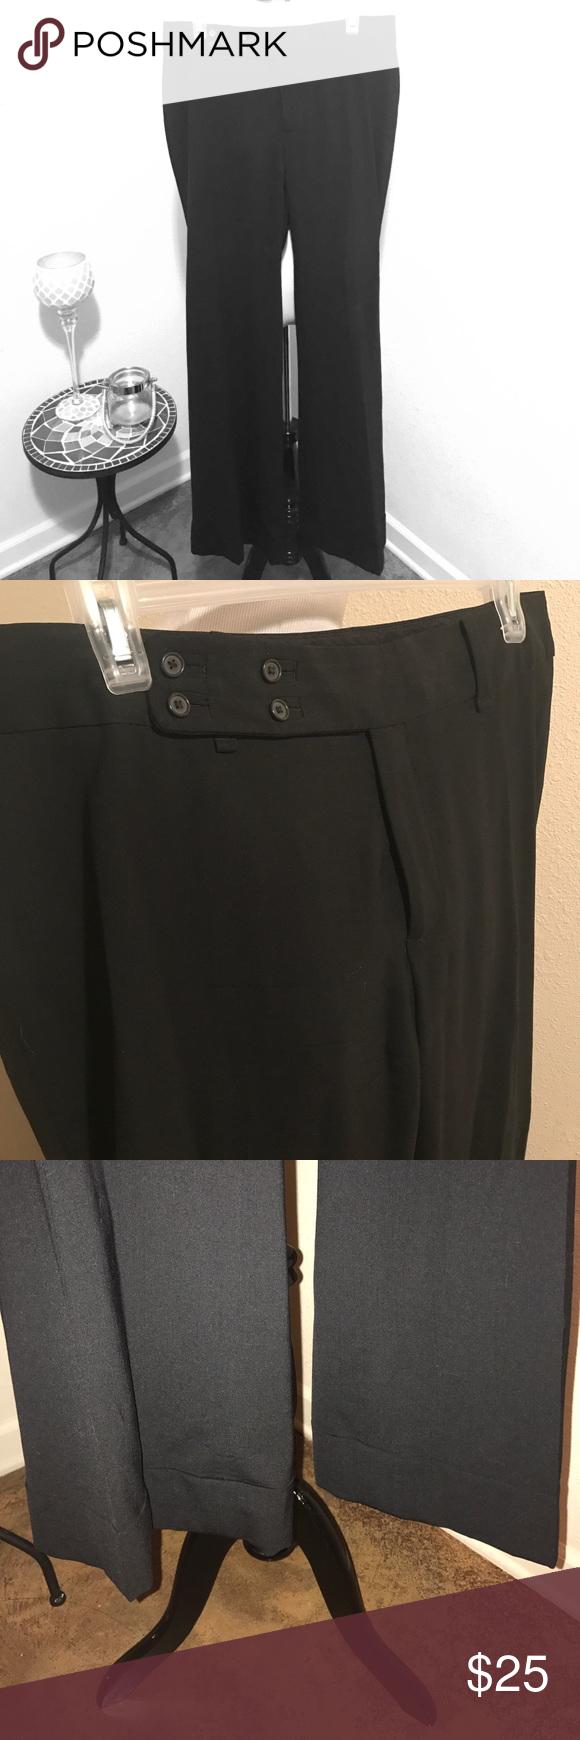 "Banana Republic black slacks! Stretch fit Banana Republic black slacks! Stretch fit. Barely worn, so like new! The fit is called ""Jackson Fit."" Size 12 Banana Republic Pants"